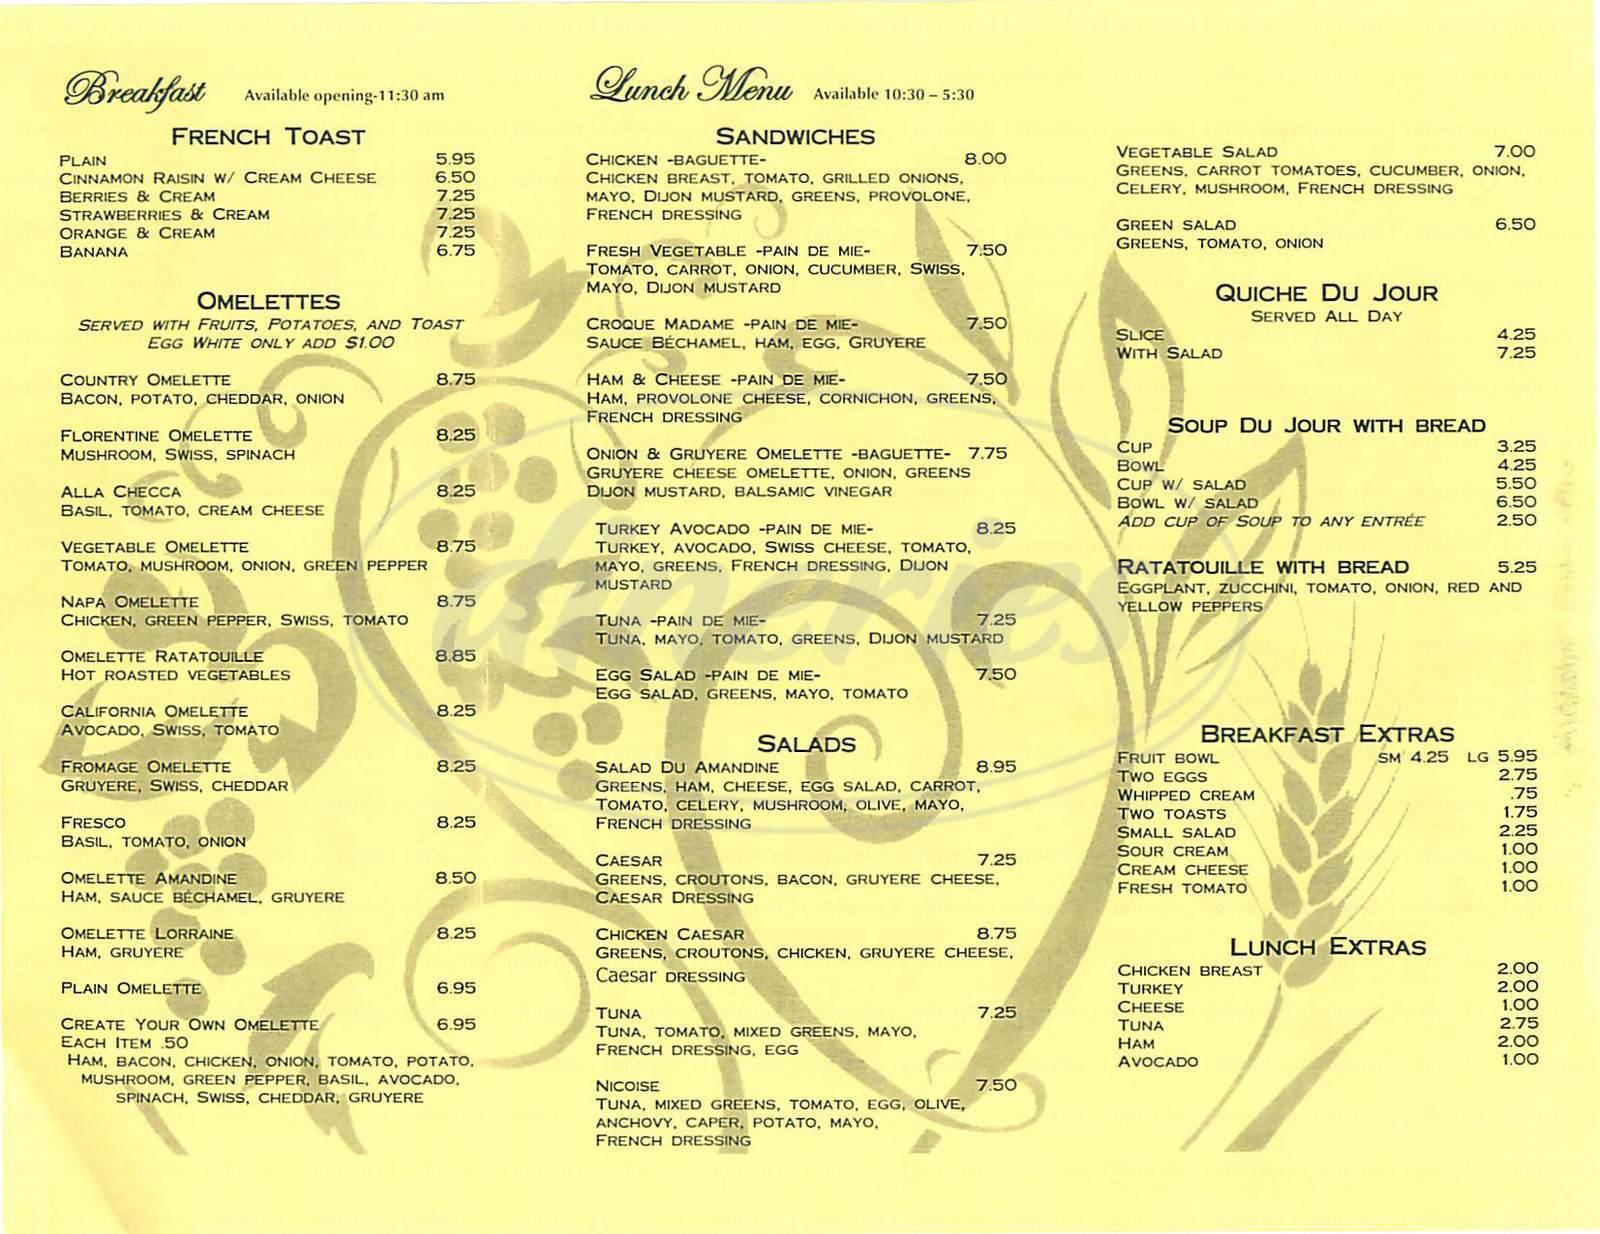 menu for Amandine